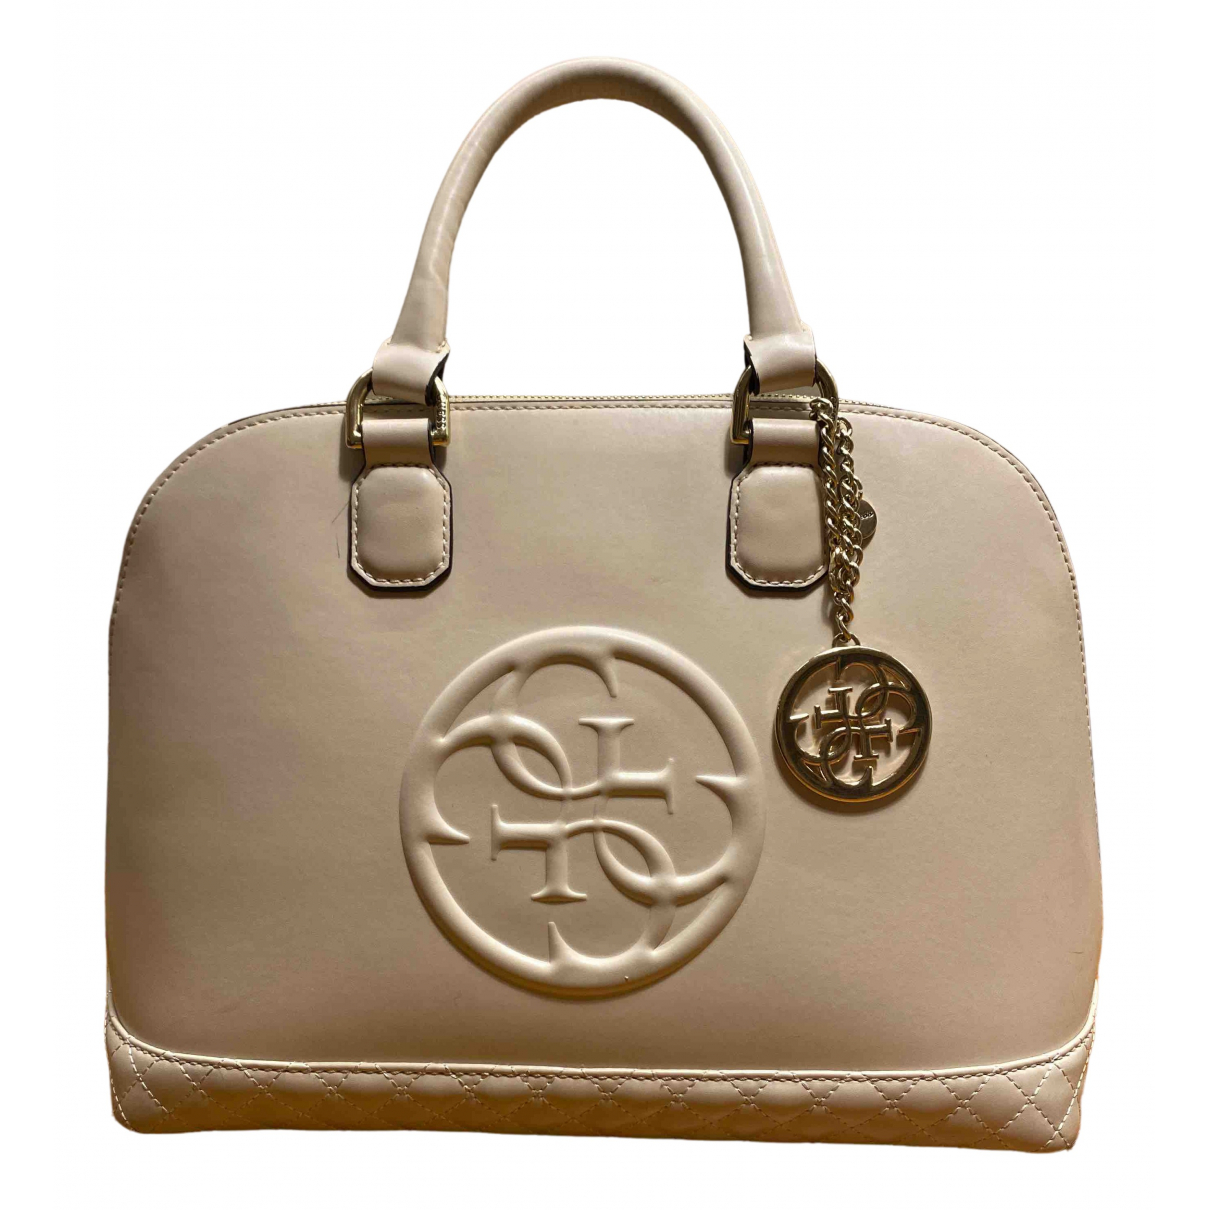 Guess \N Handtasche in  Beige Polyester